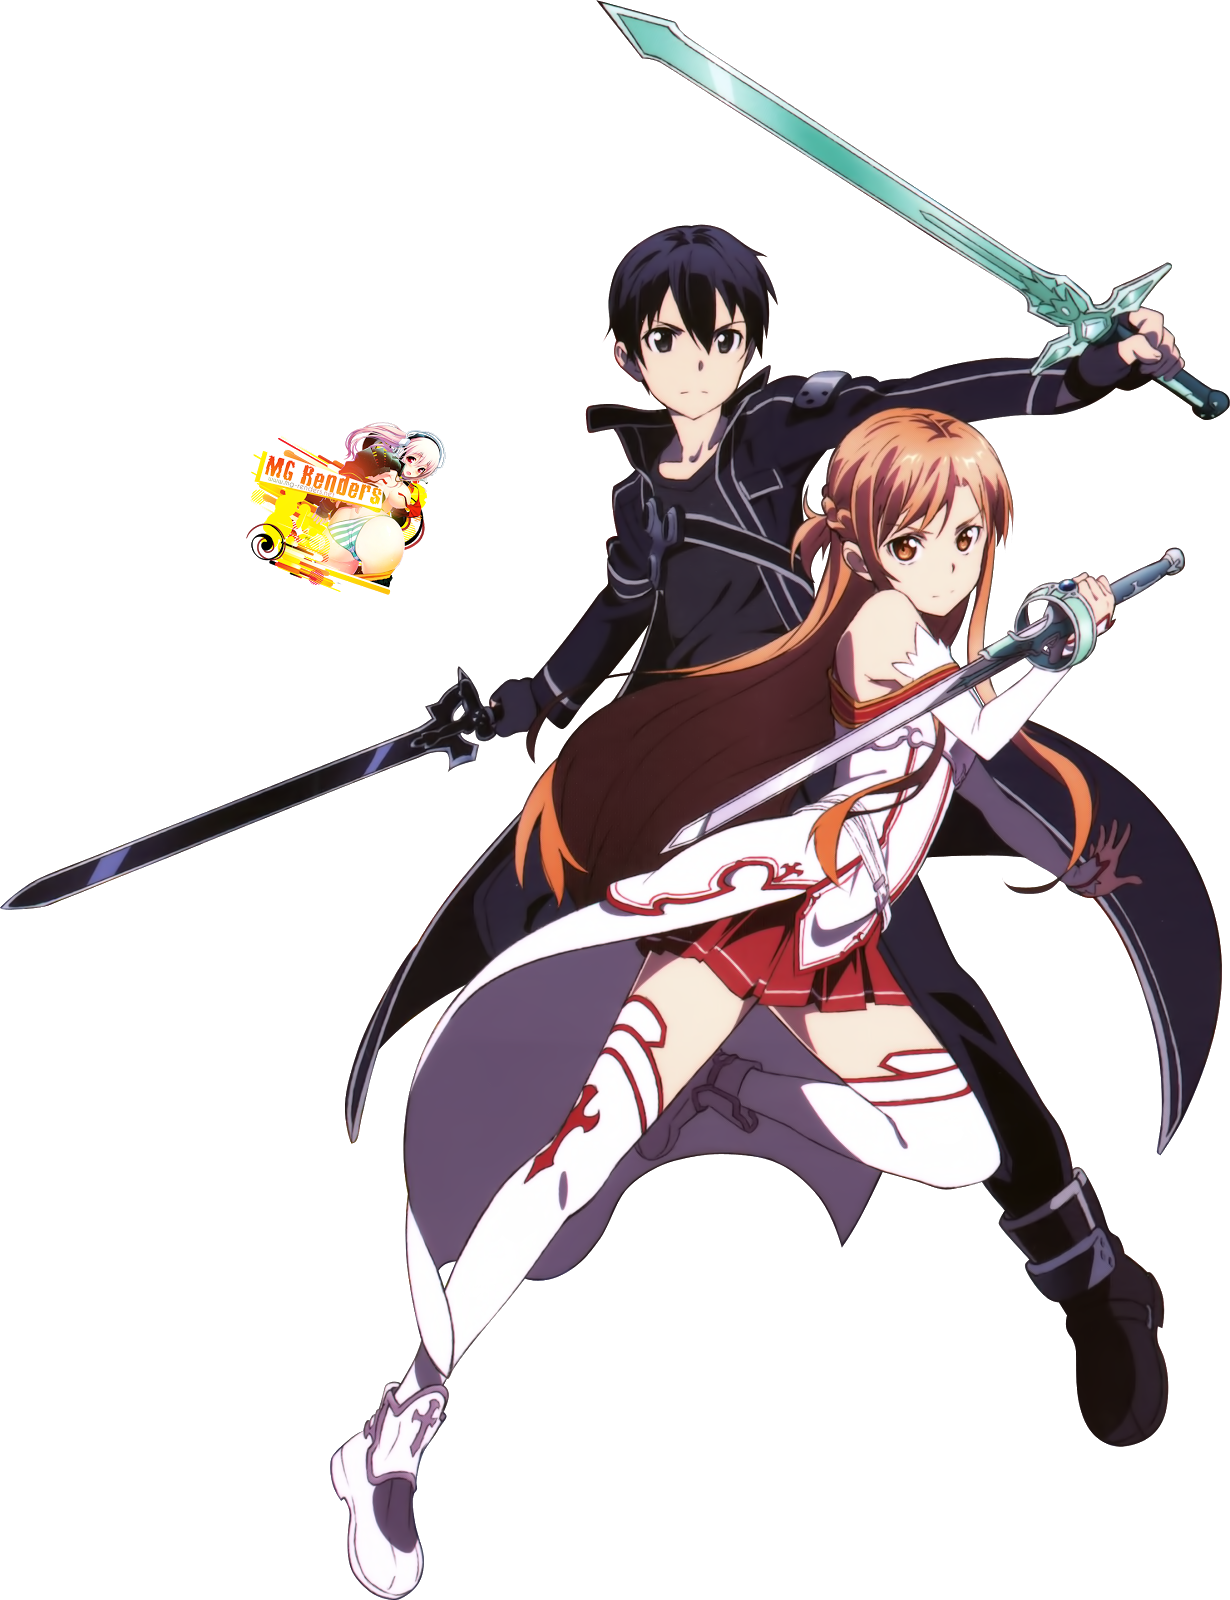 Tags: Anime, Render,  Kirito (Kirigaya Kazuto),  Sword Art Online,  Yuuki Asuna, PNG, Image, Picture